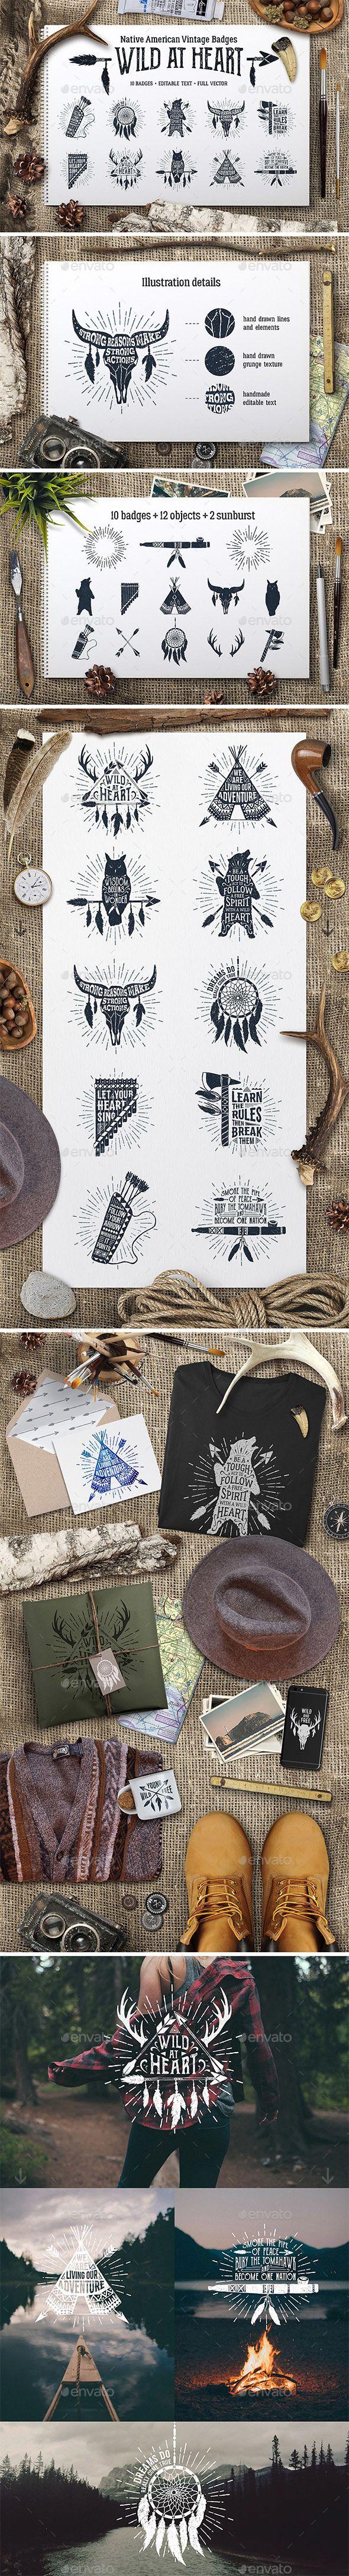 Wild at Heart Native American Vintage Badges Templates Vol.1 - PSD, Transparent PNG, Vector EPS, AI Illustrator